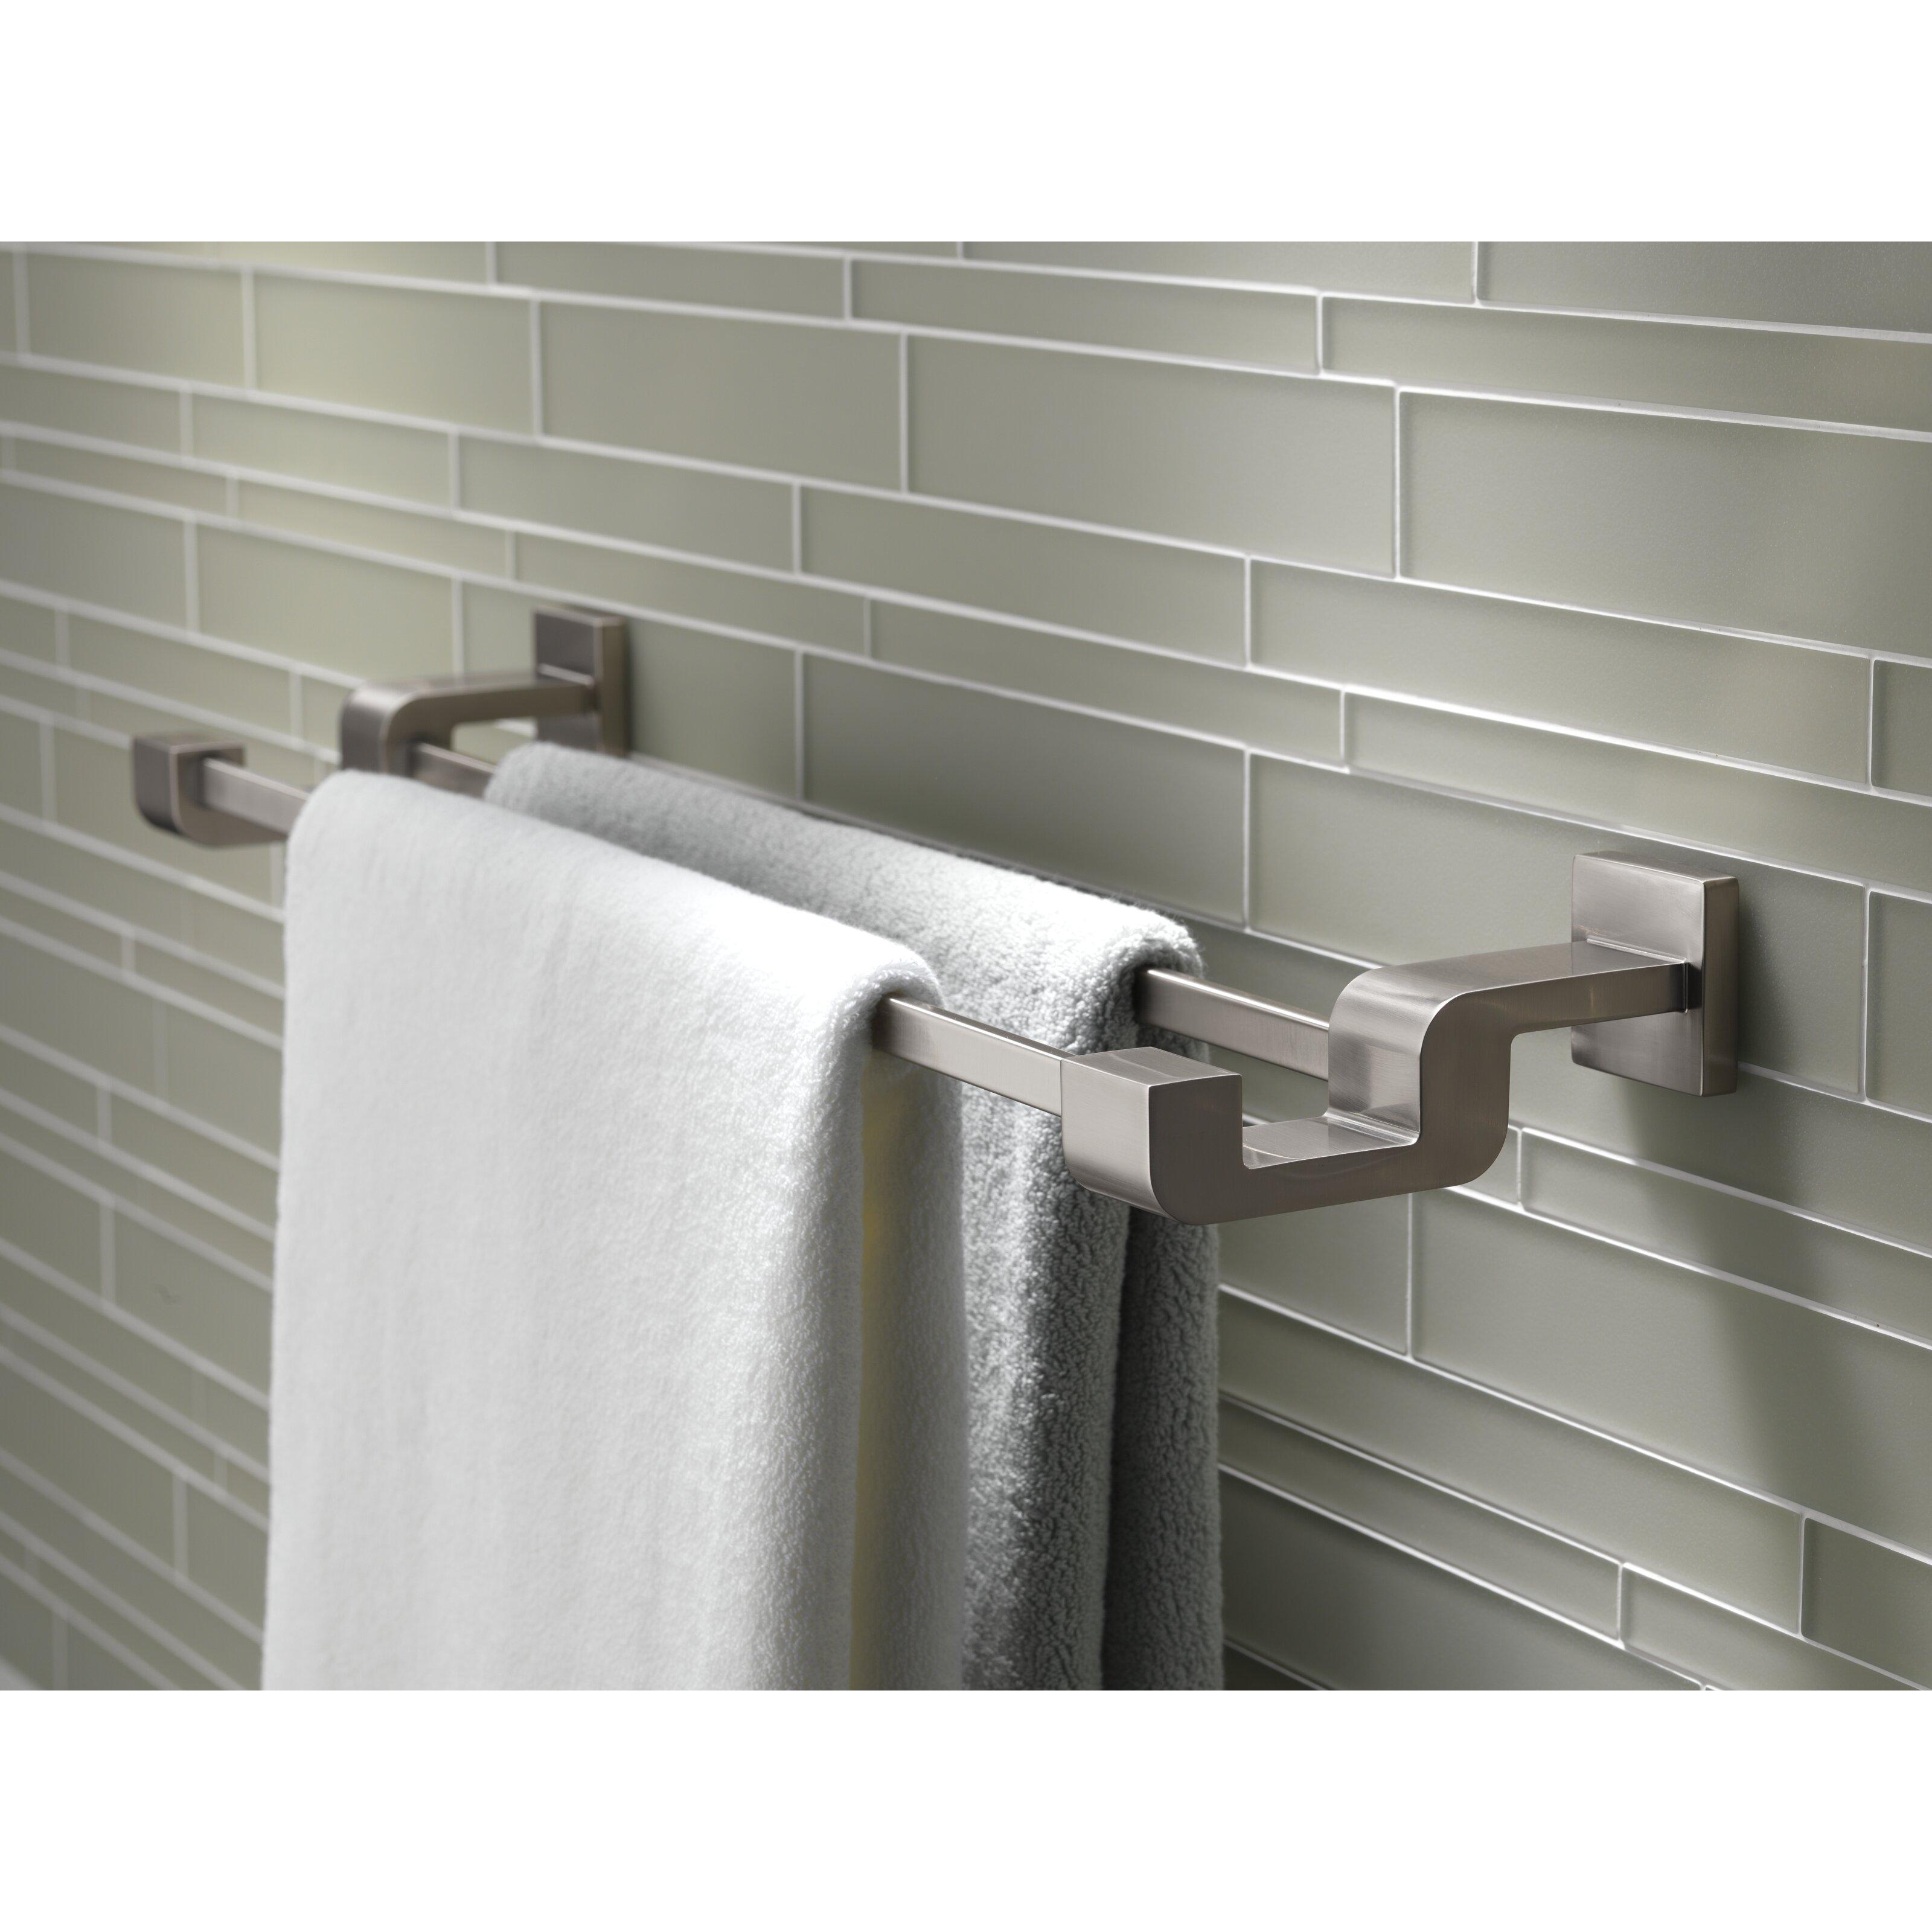 "Delta Urban Arzo 24"" Wall Mounted Towel Bar"